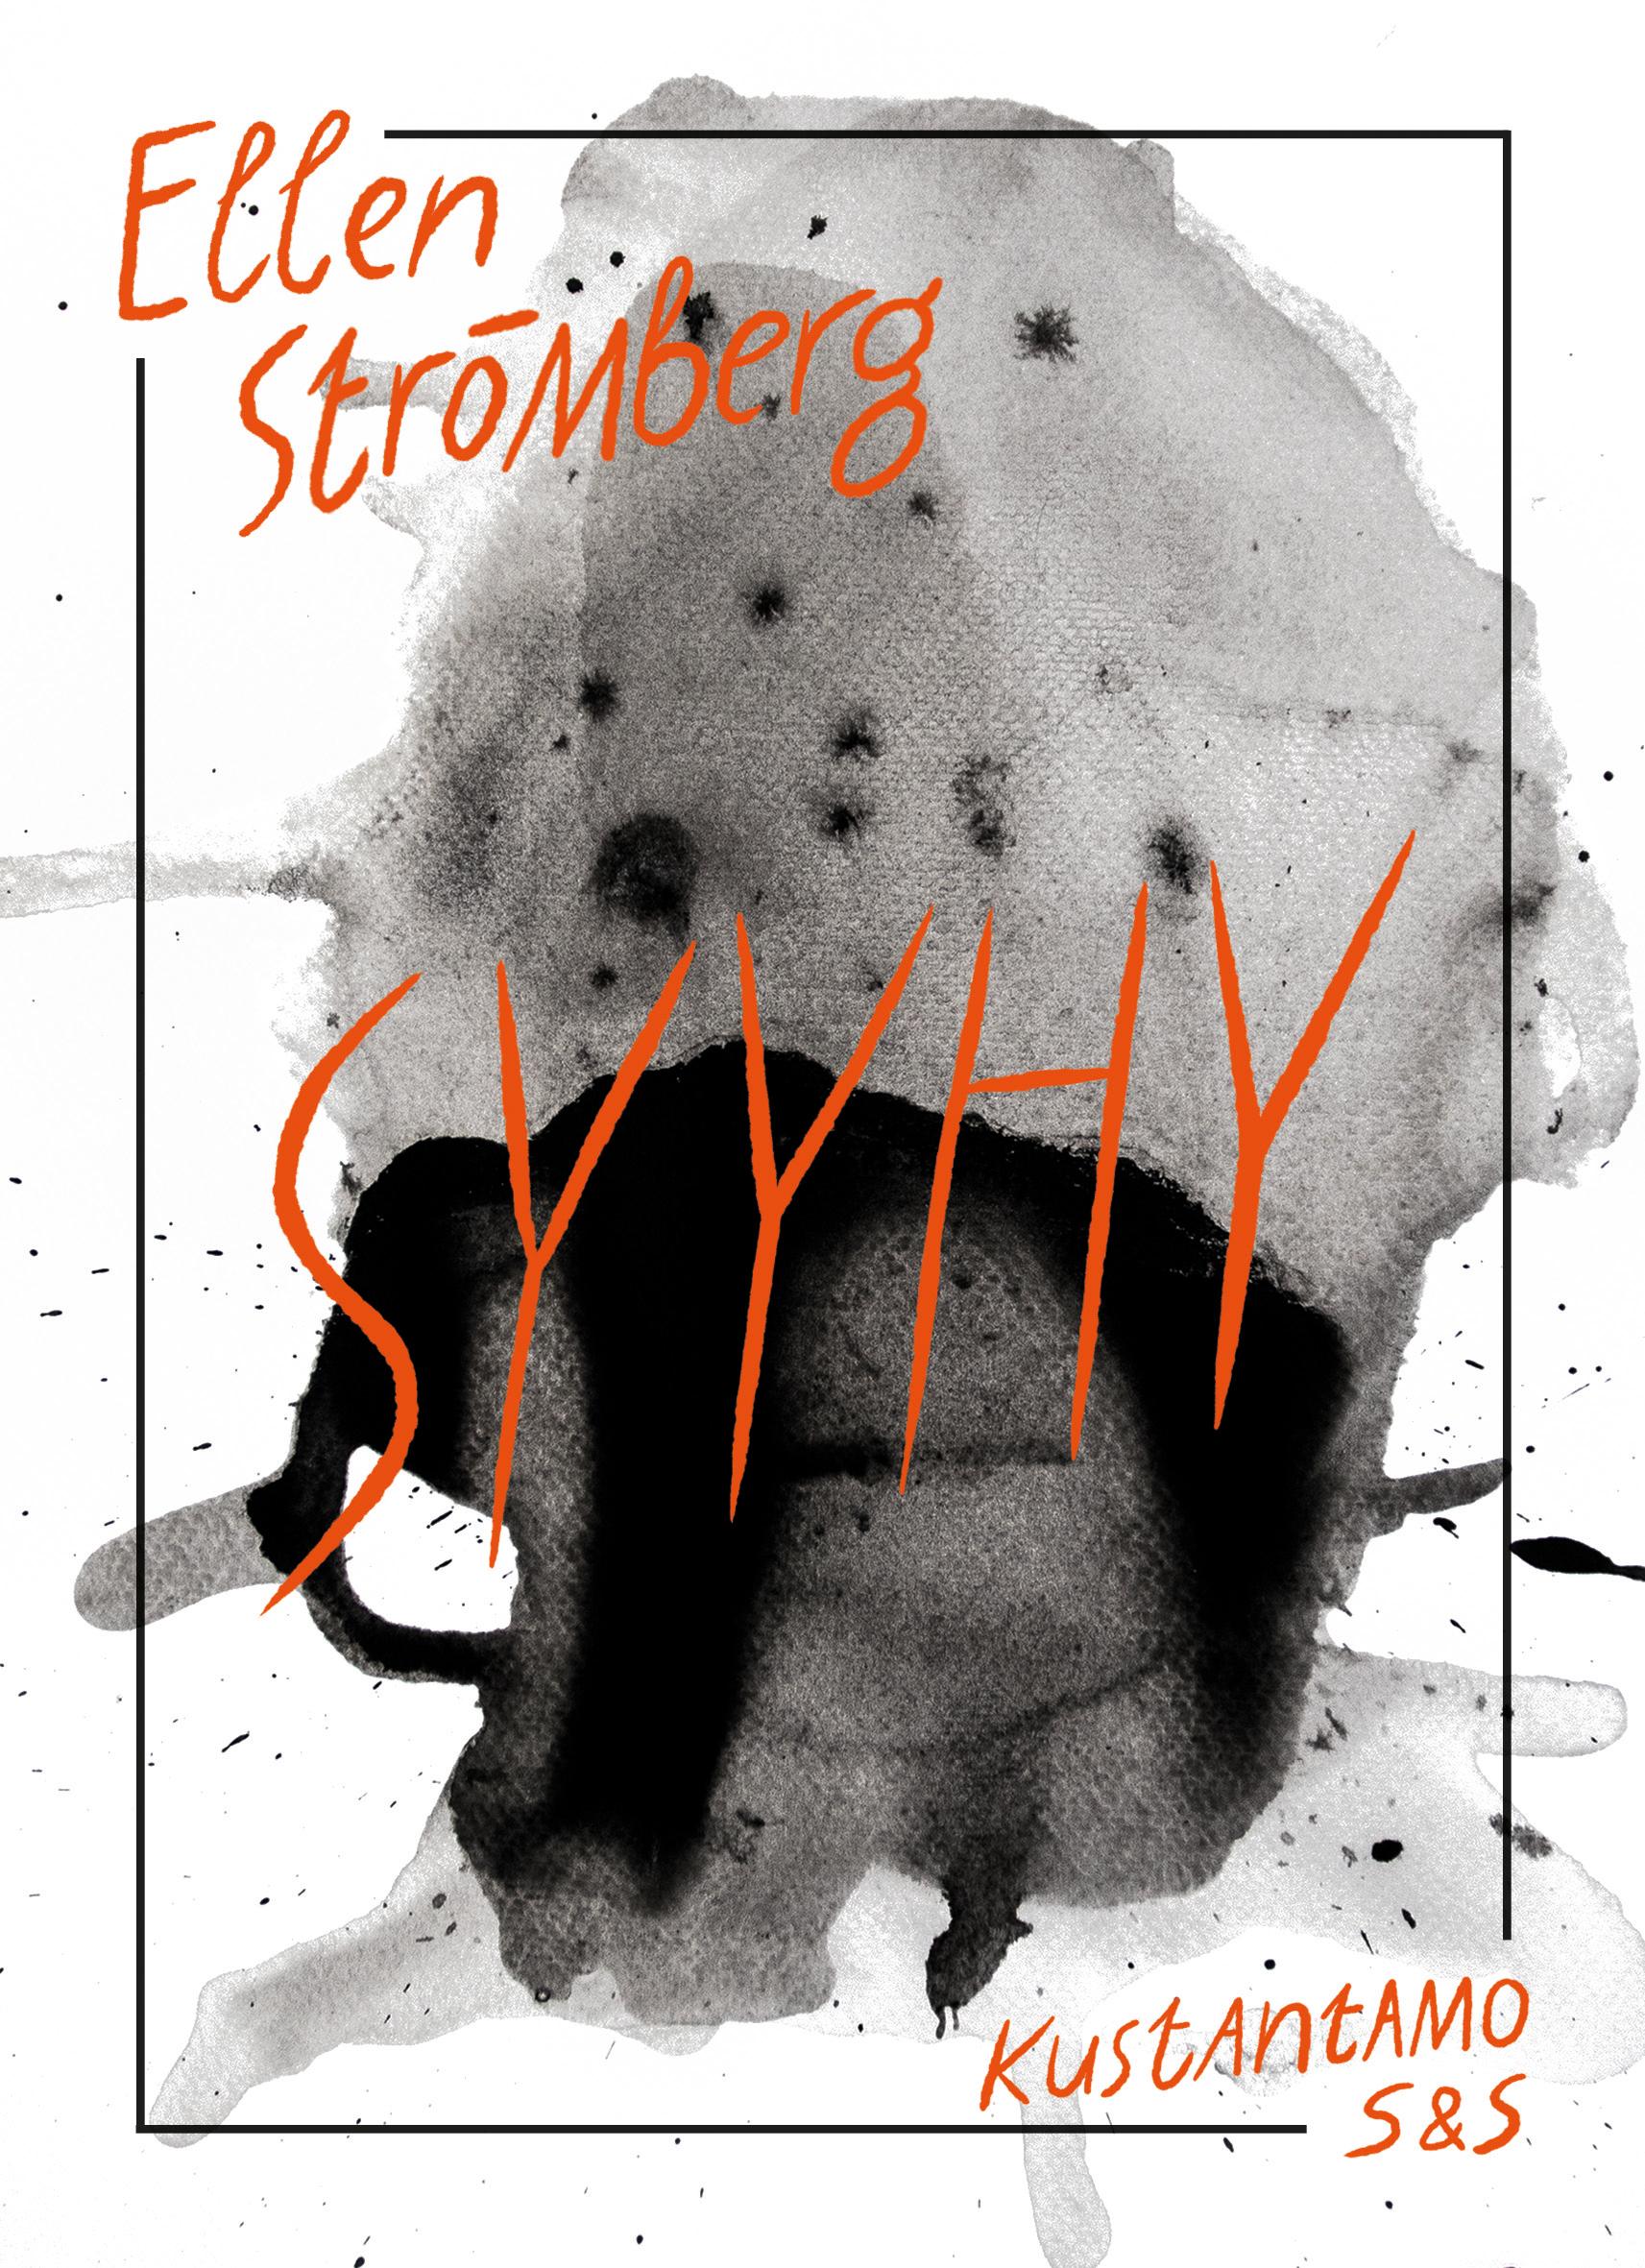 Syyhy